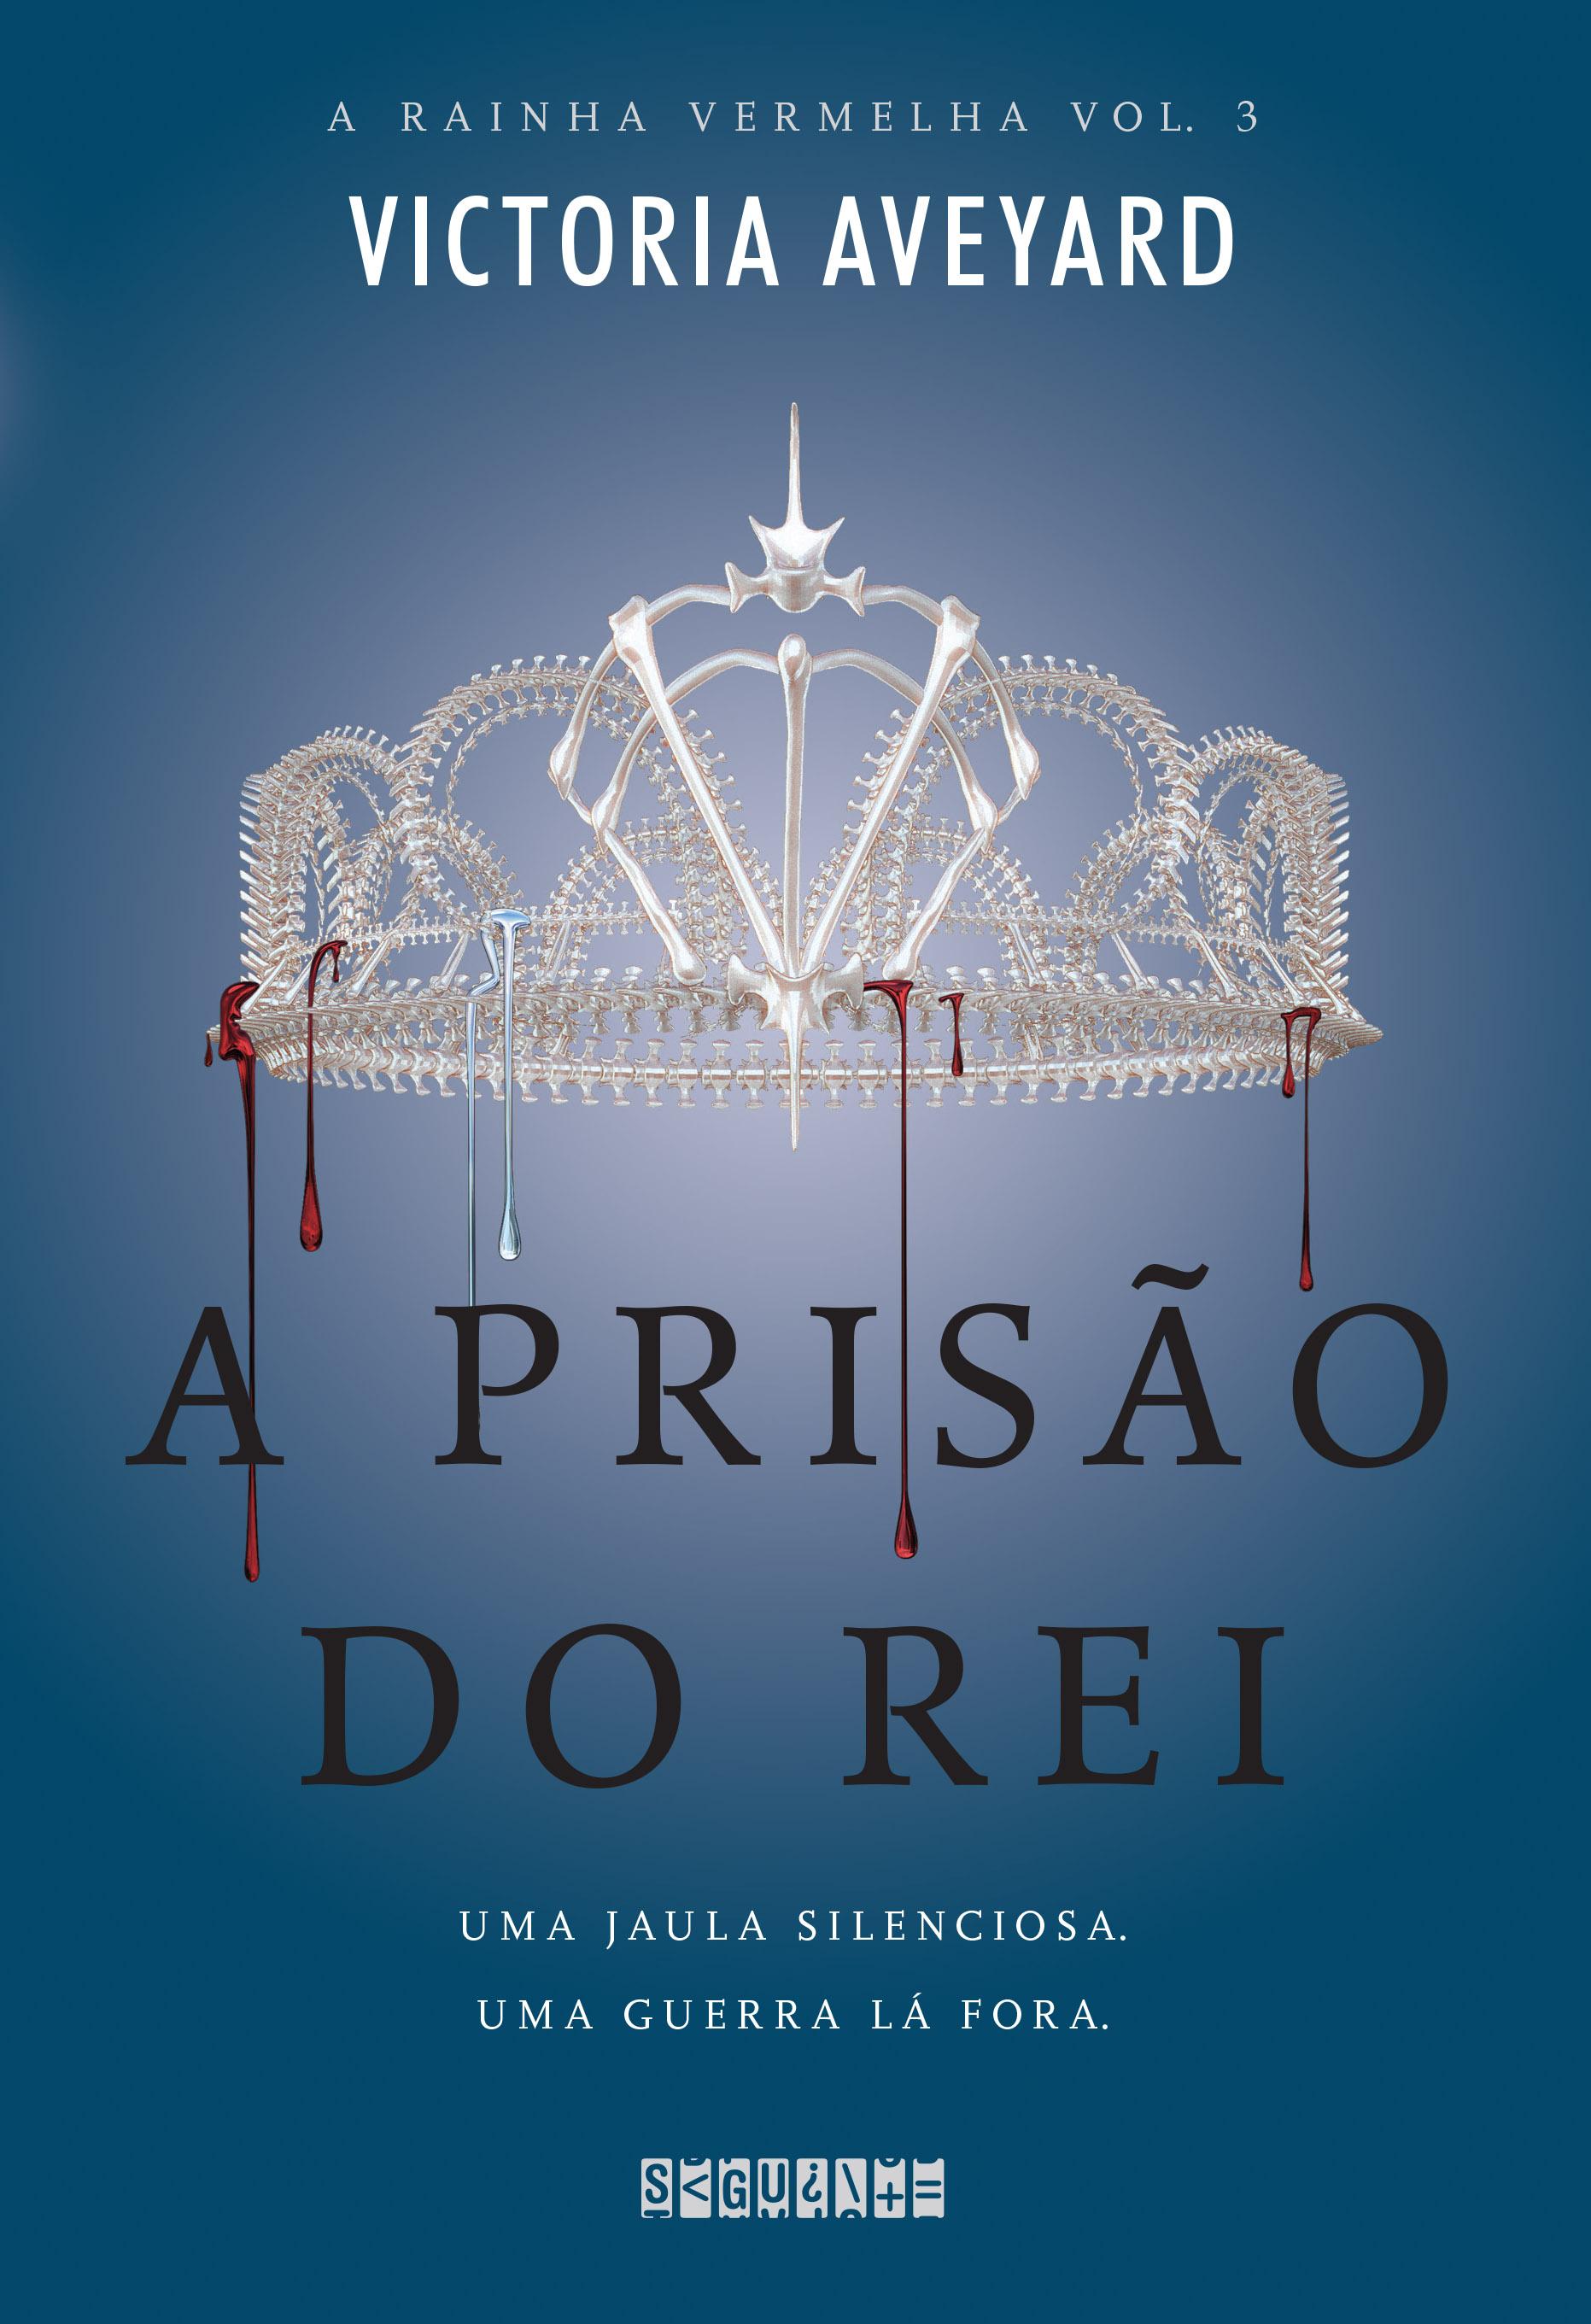 PRISAO DO REI, A